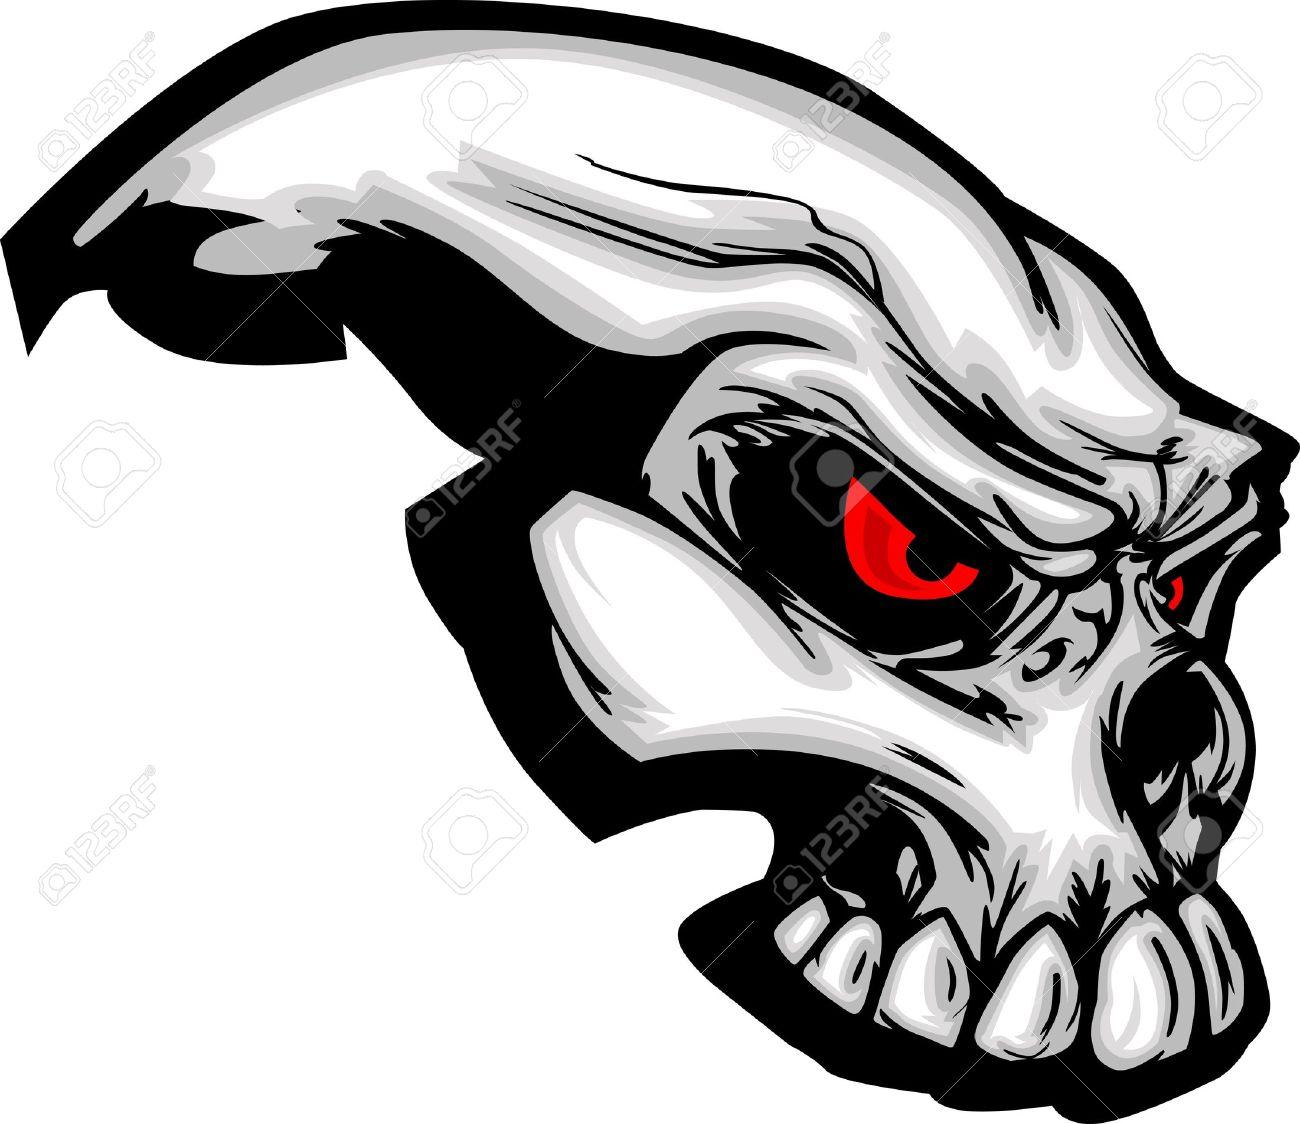 Skull with Cartoon Image Stock Vector - 10369957